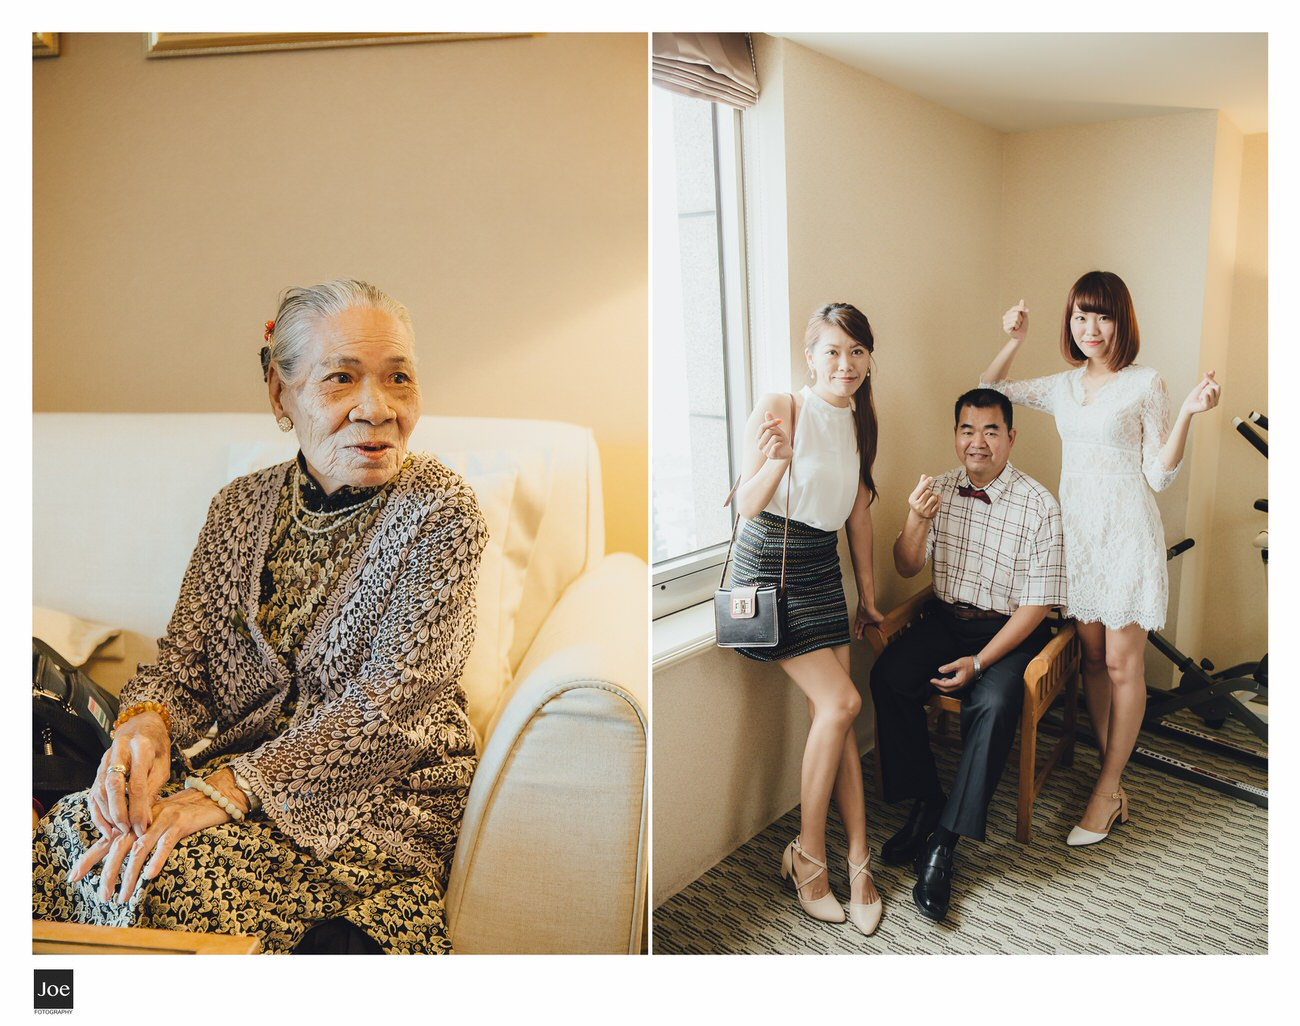 grand-hilai-hotel-wedding-daniel-yvette-joe-fotography-012.jpg